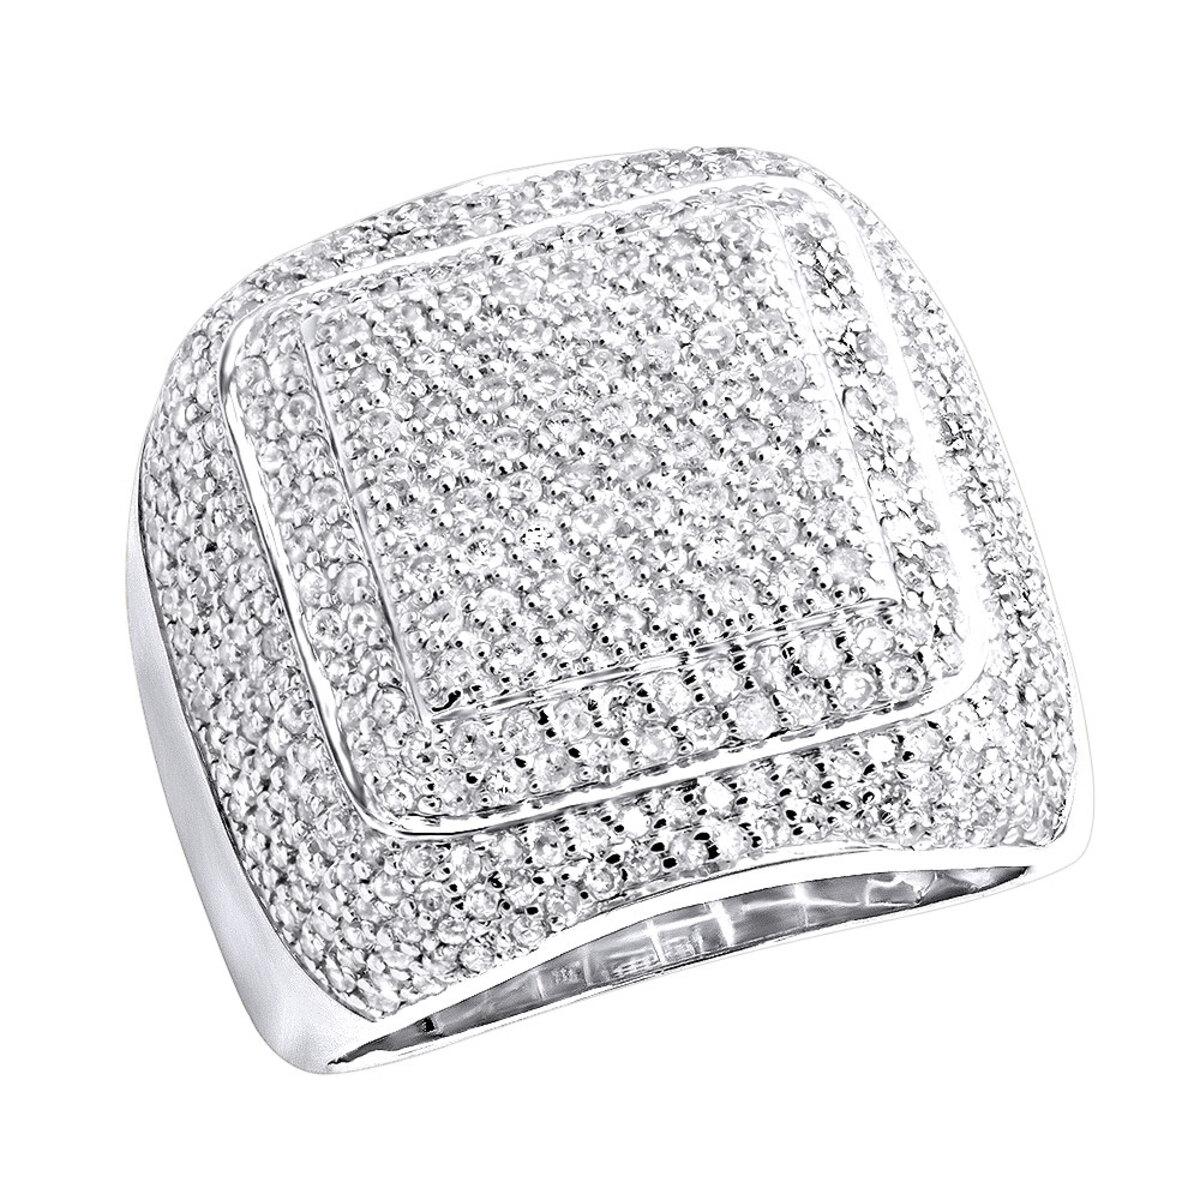 Mens Diamond Rings 14K Gold Square Ring 3.44ct